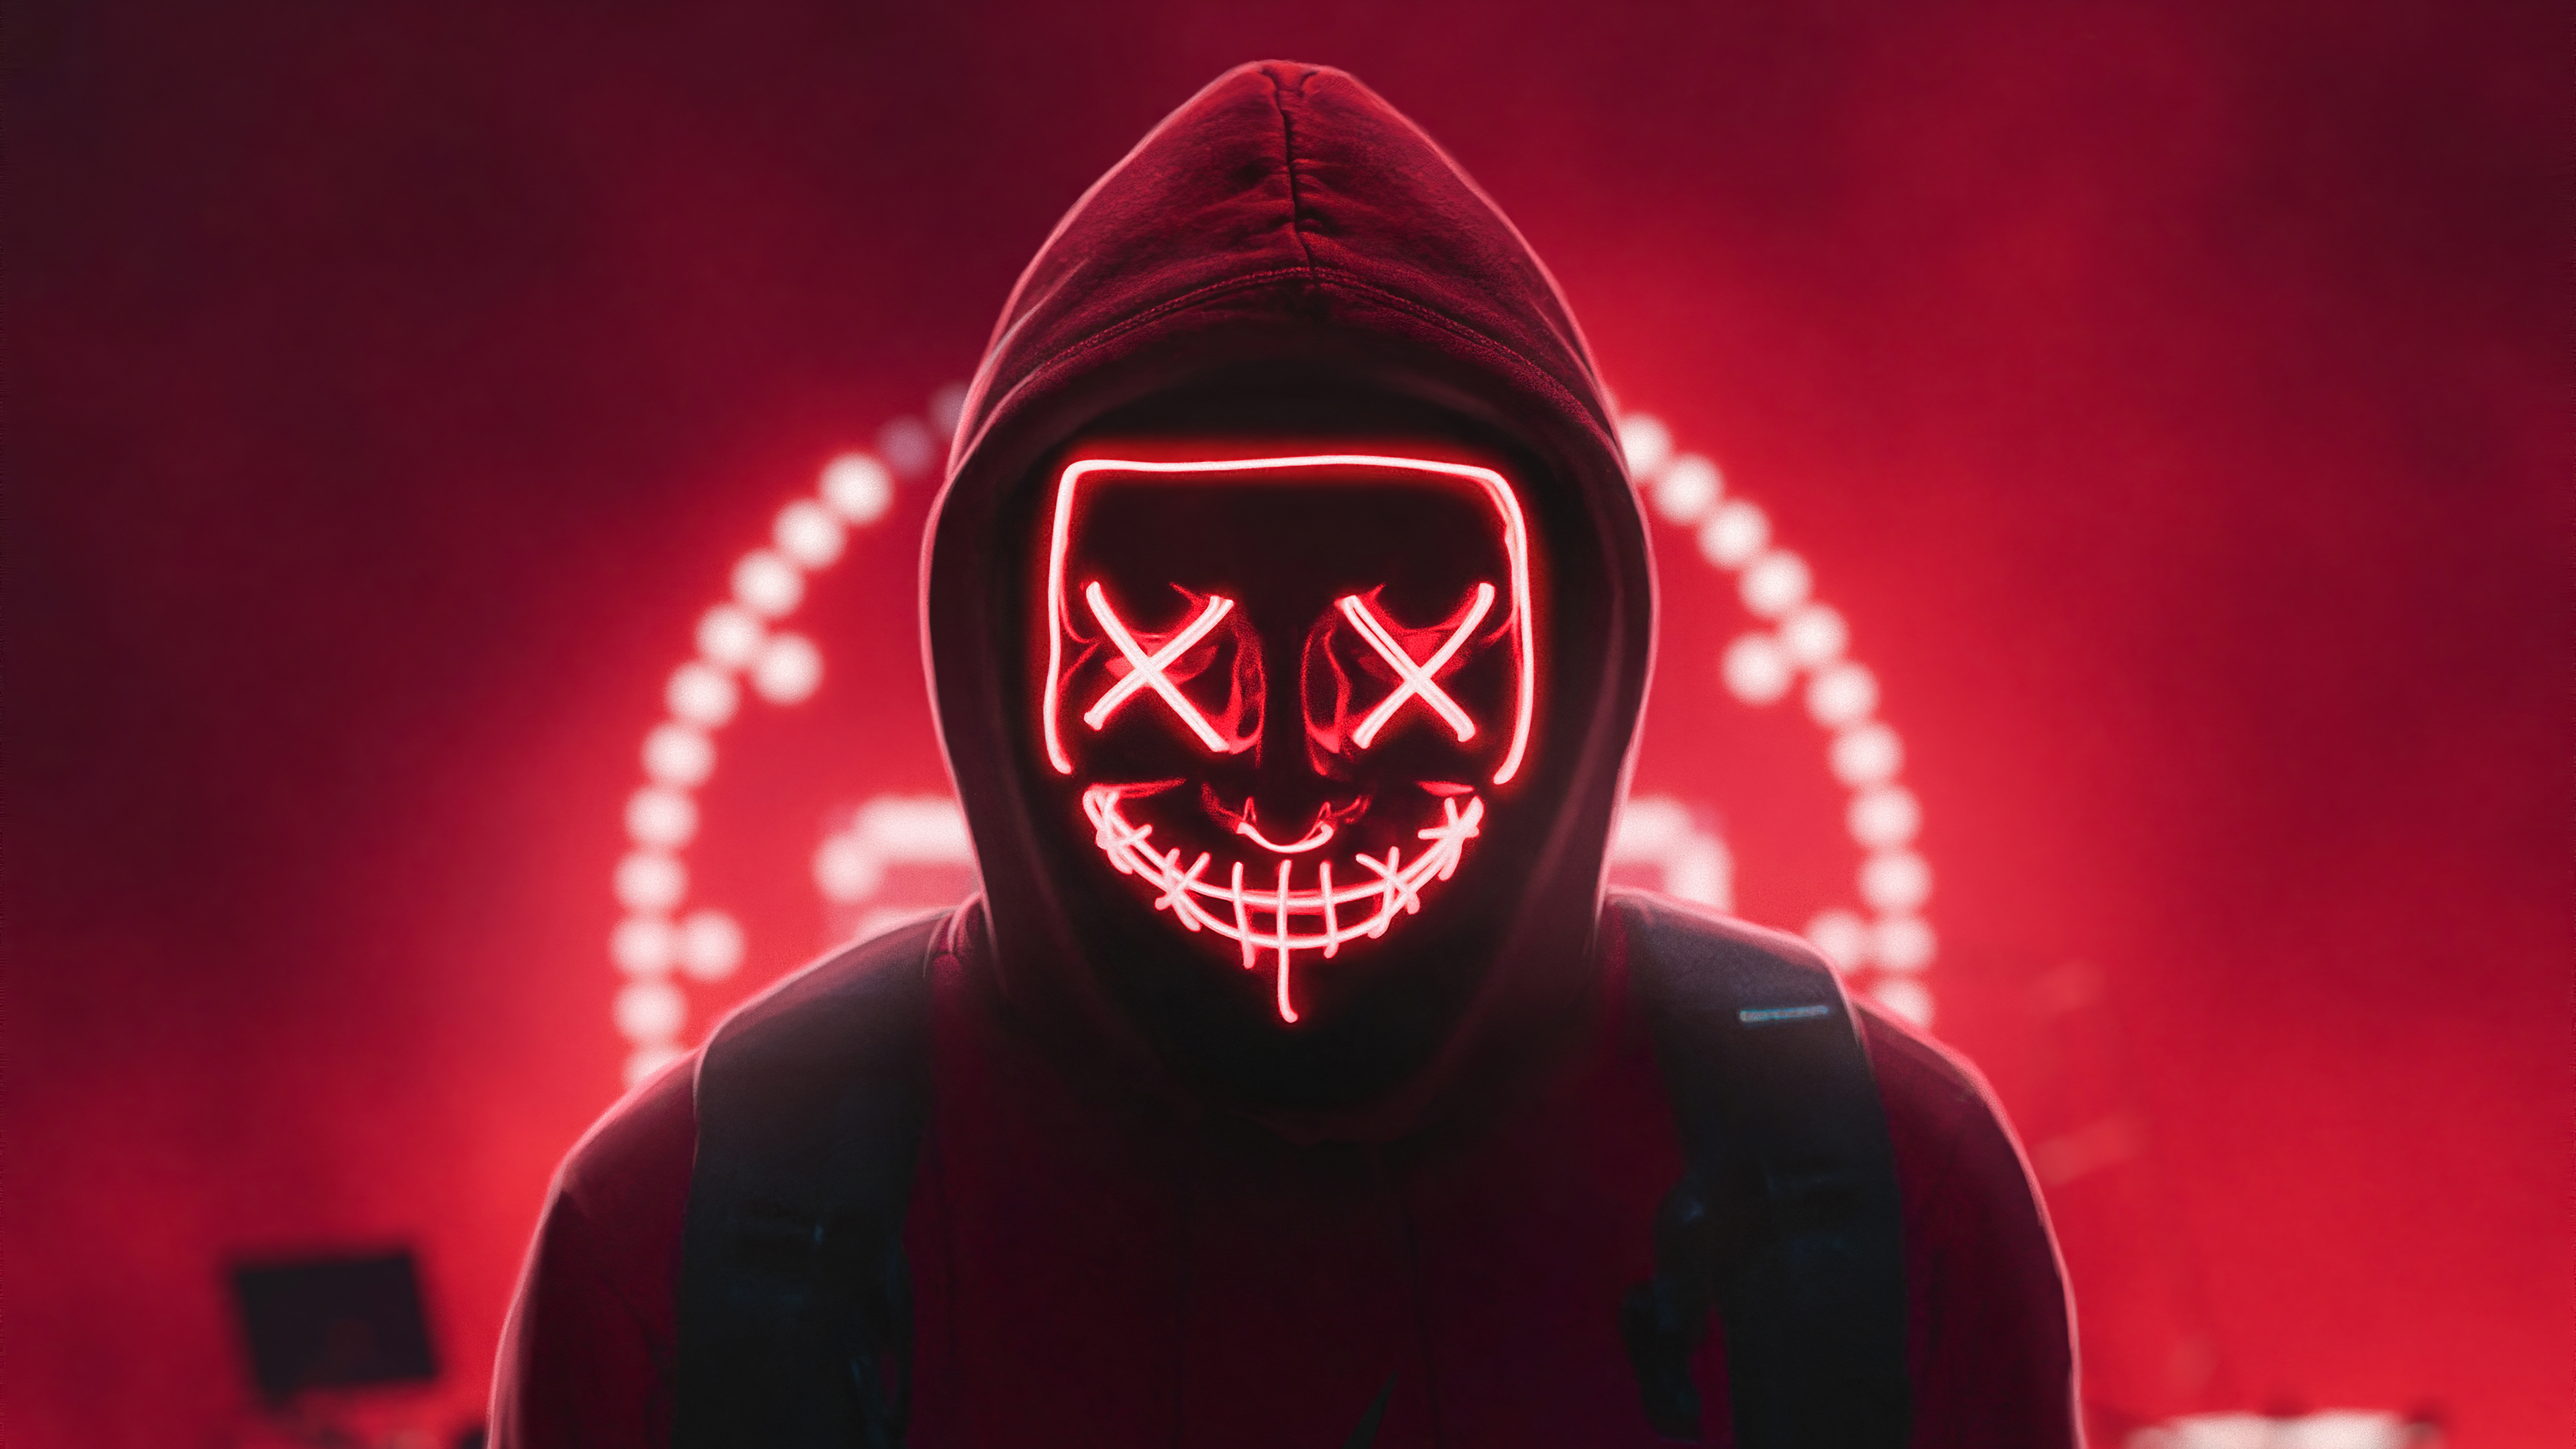 neon man 1574938550 - Neon Man -